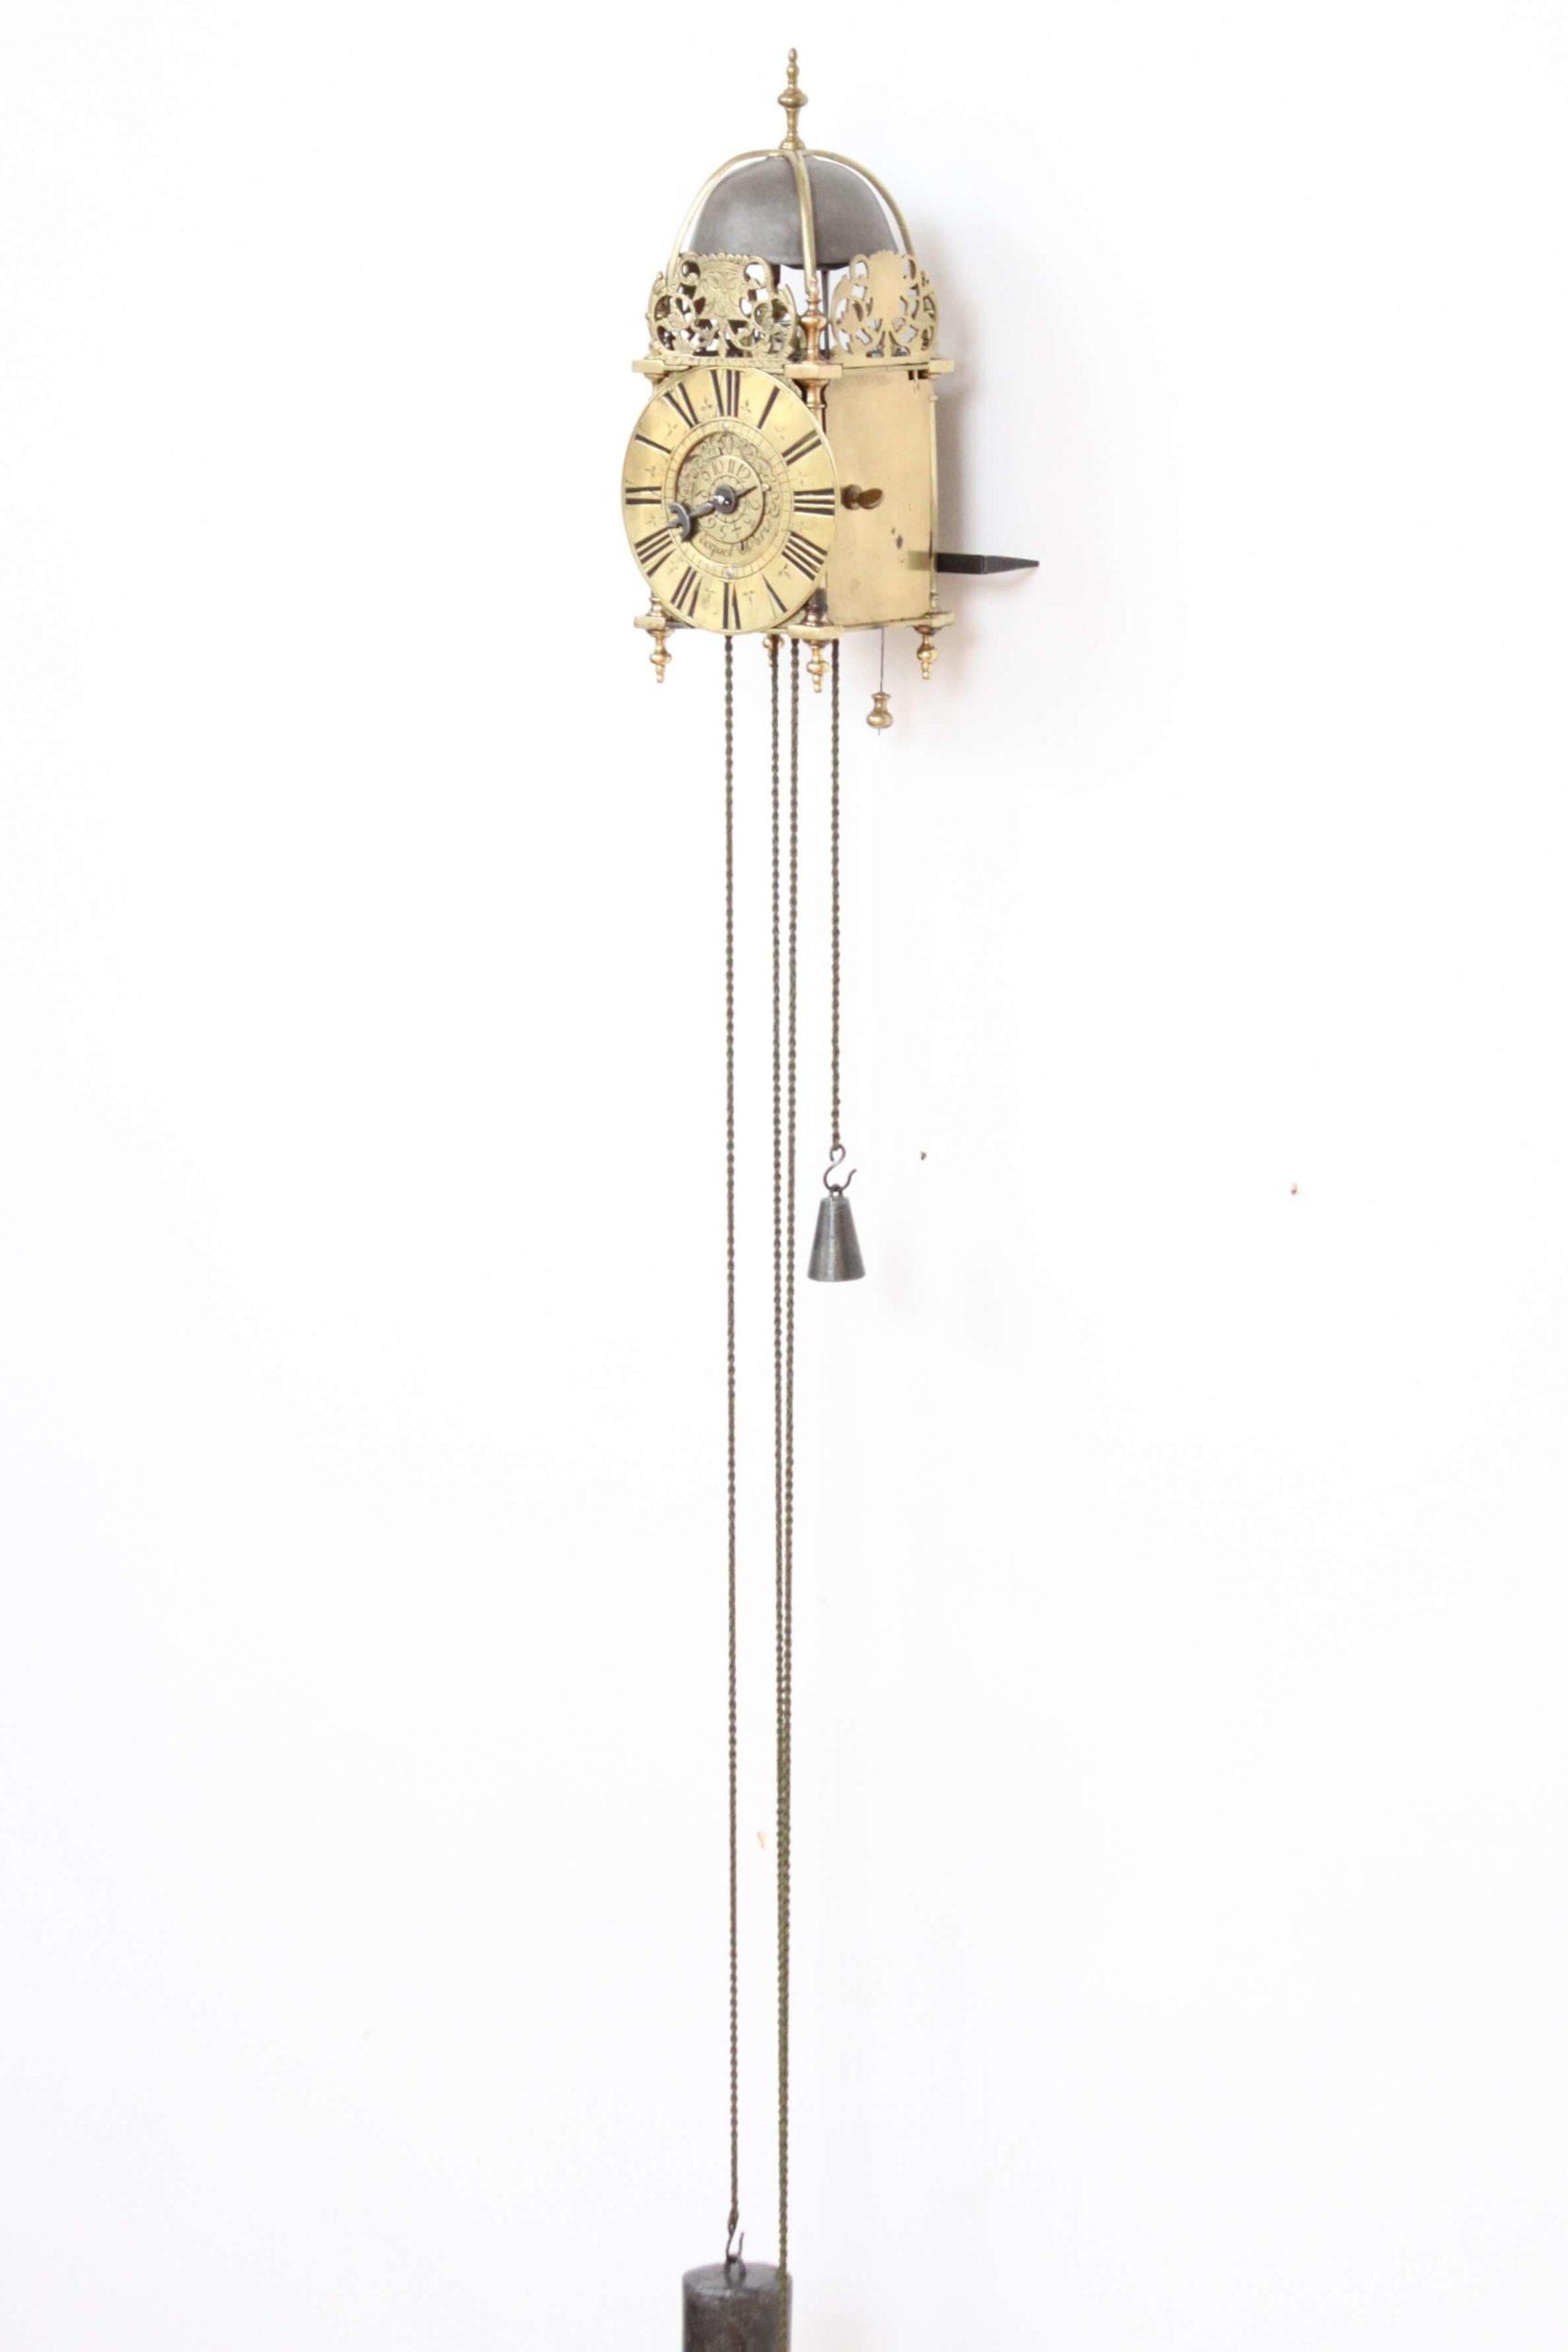 French-regence-brass-miniature-alarm-lantern-antique-wall-clock-Paris-